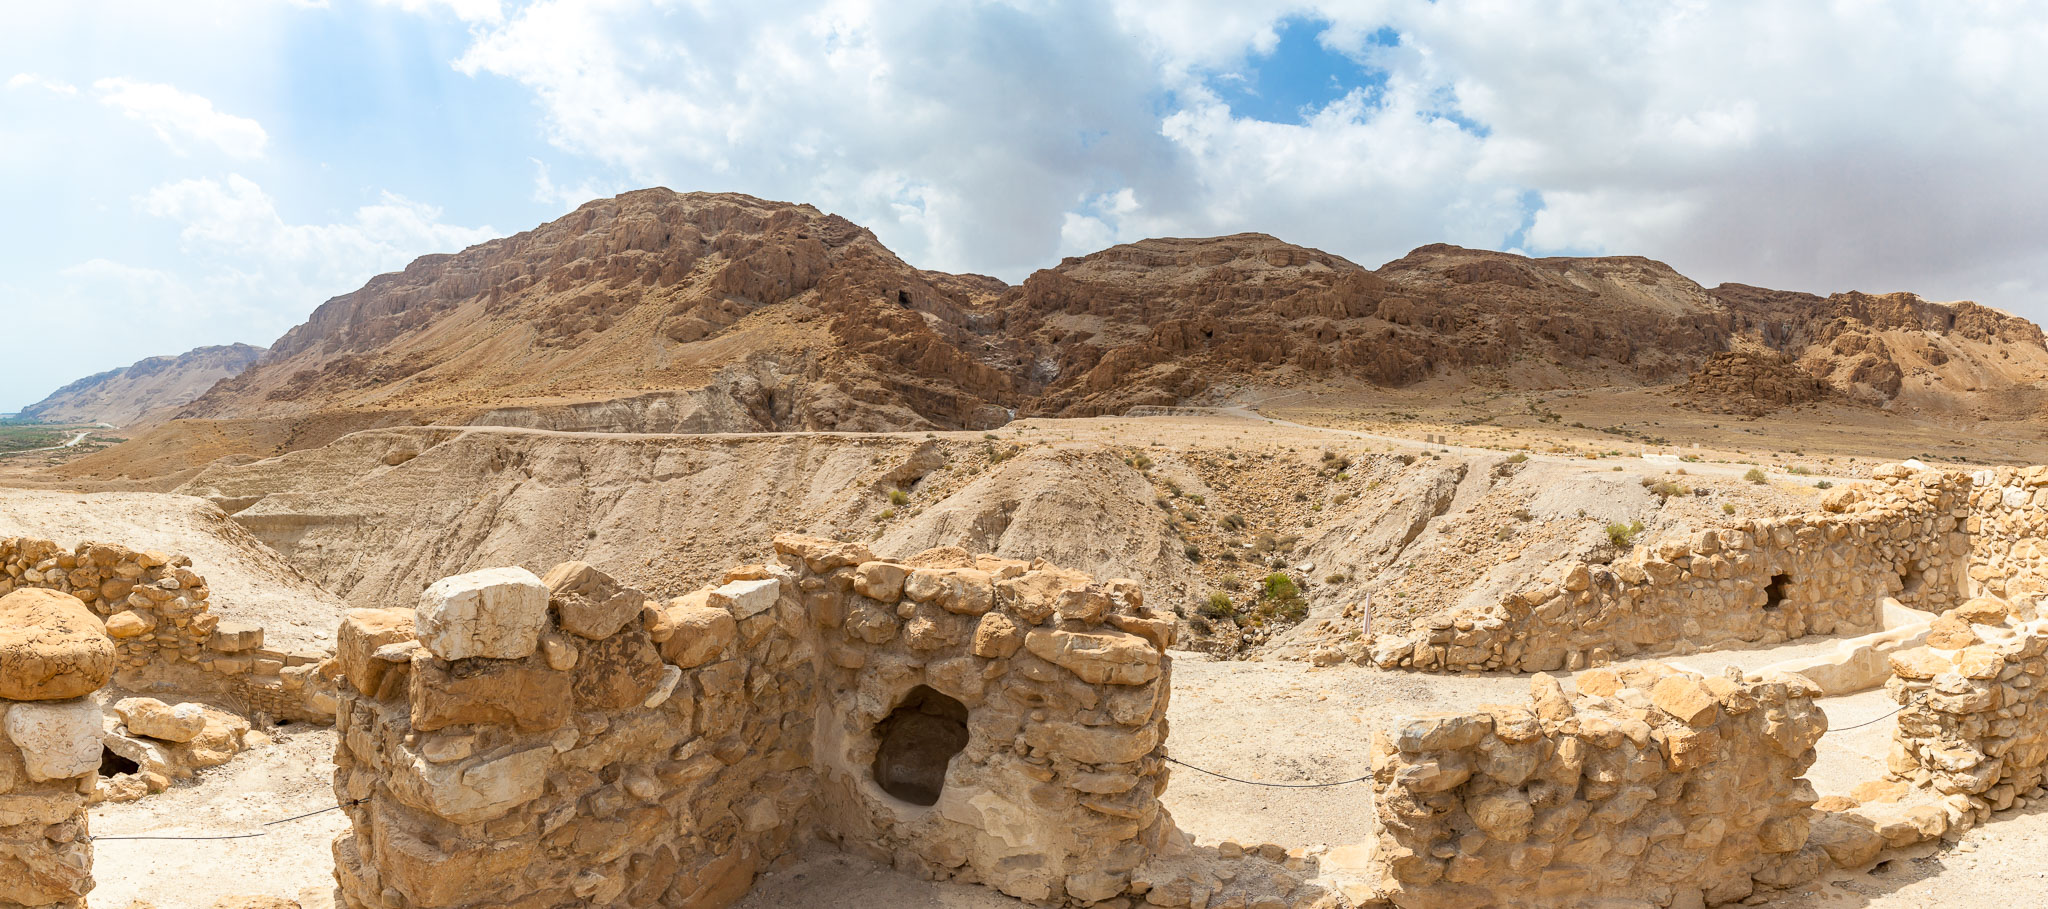 Qumran Palestine